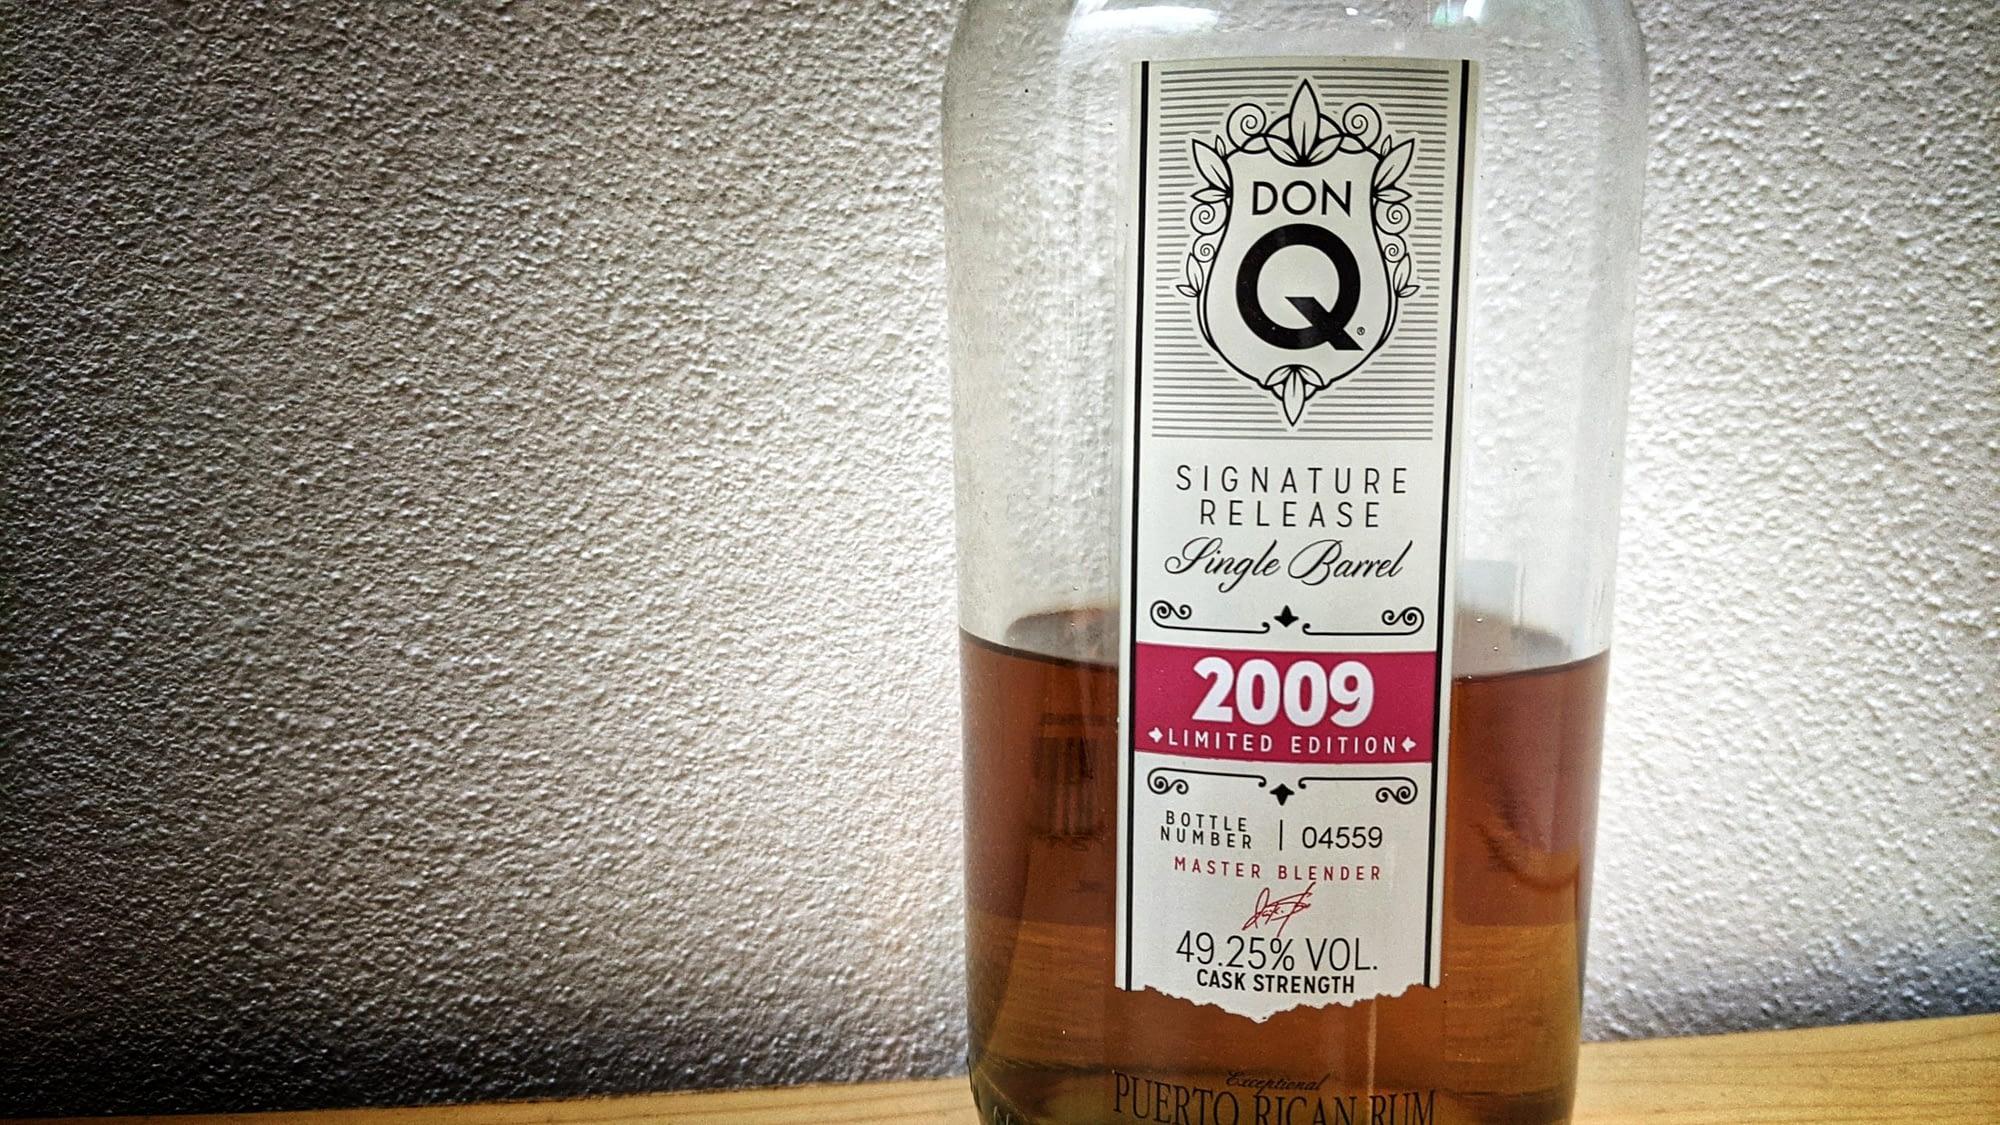 Don Q Single Barrel 2009